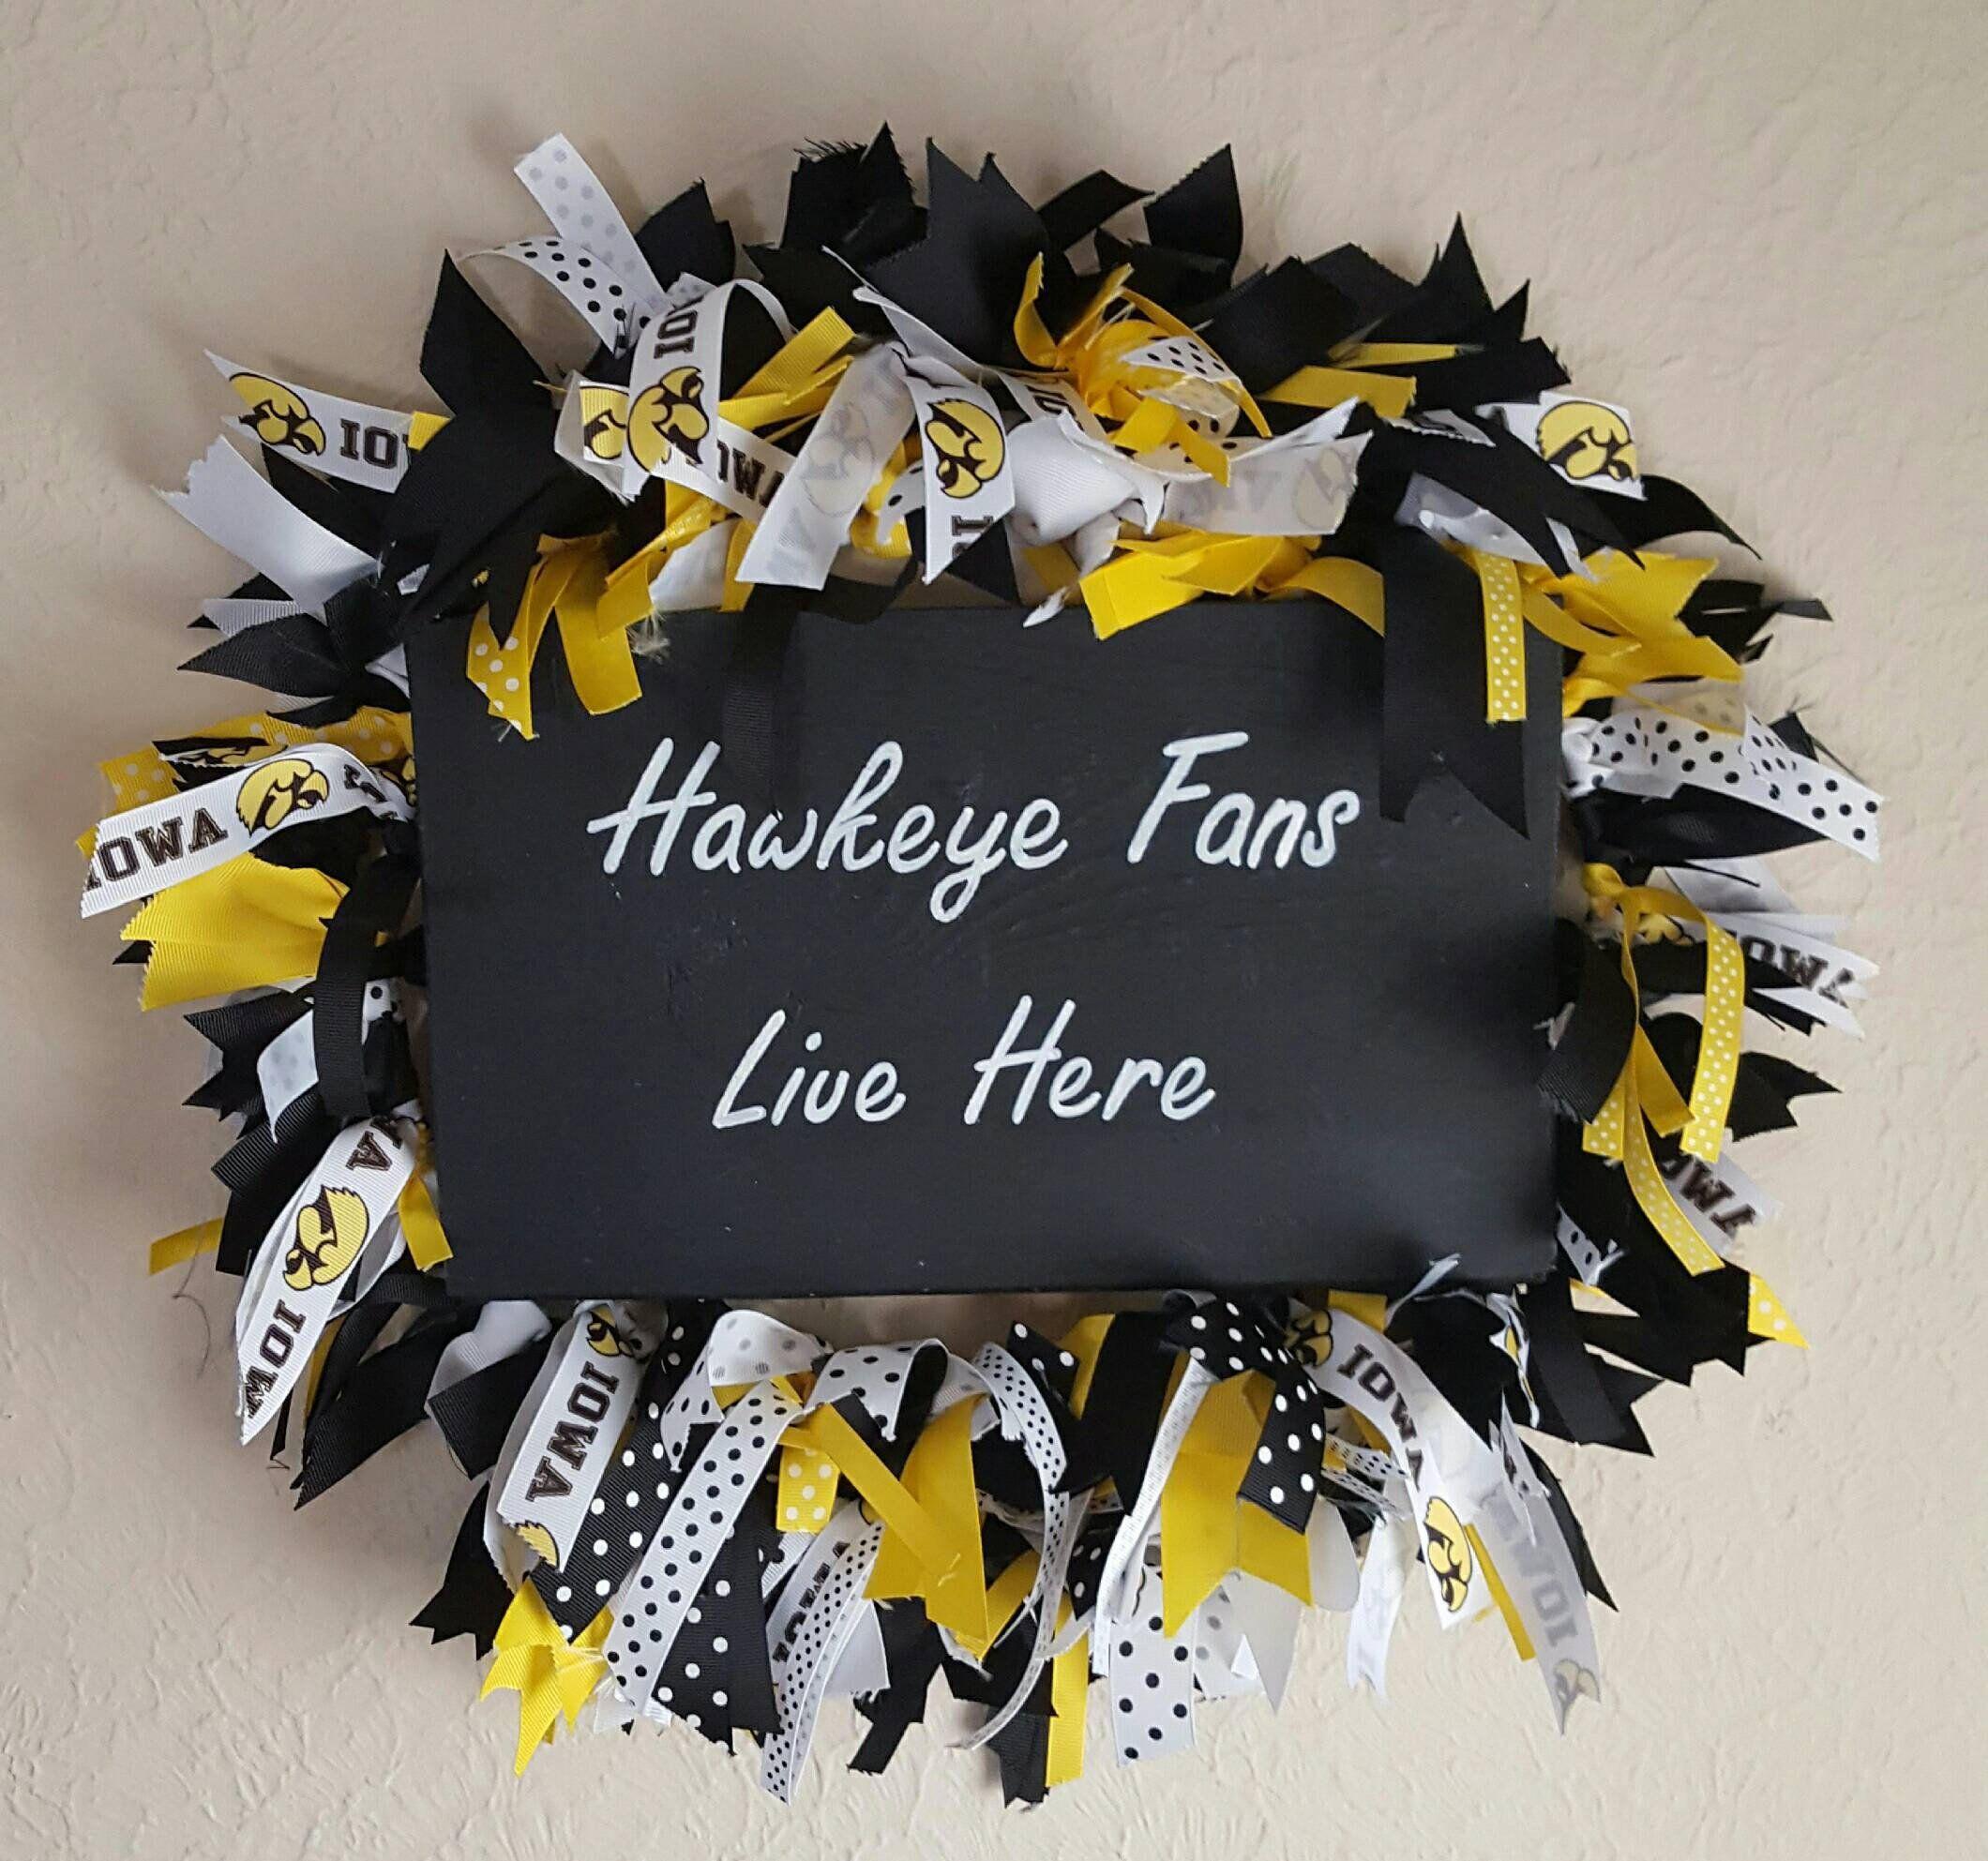 Iowa Hawkeyes Ribbon Wall Decor Wreath | Iowa and Products